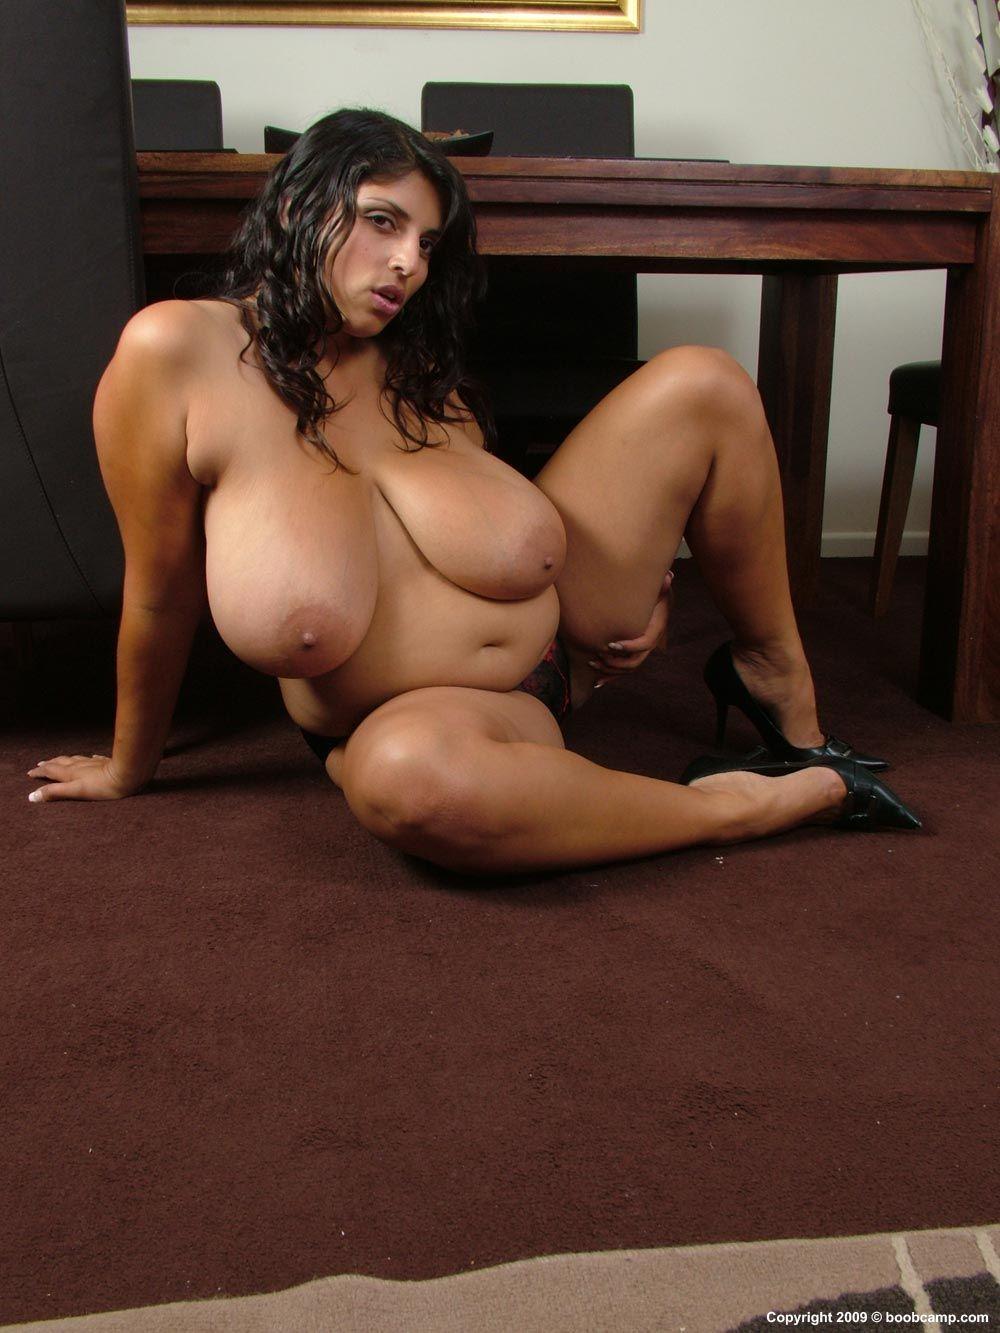 Cute girl panties middle sch